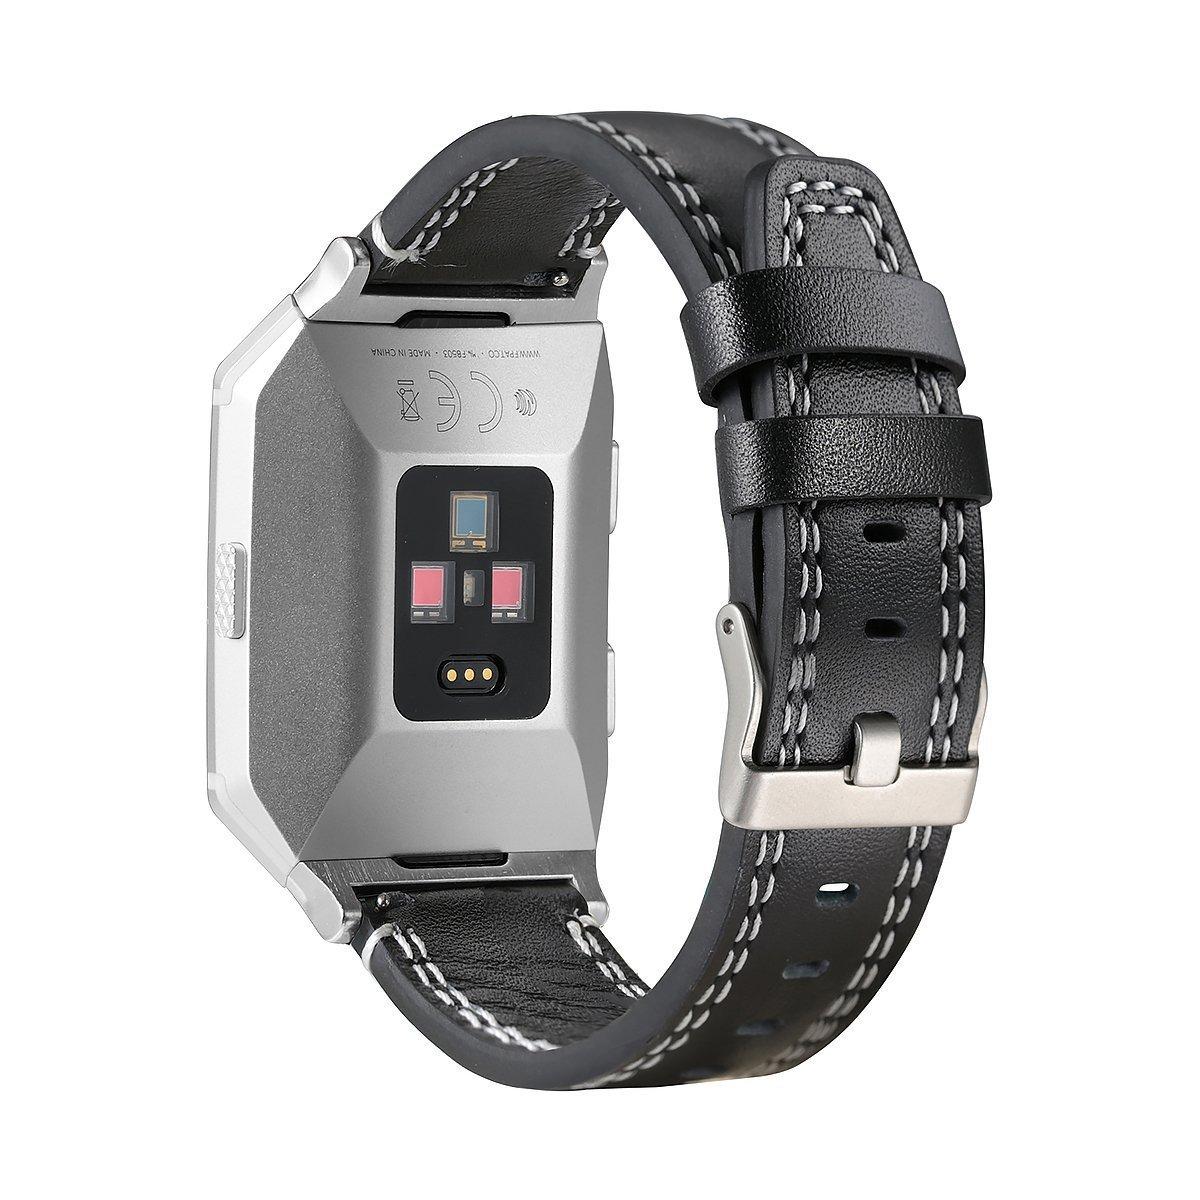 usdream本革時計バンドスポーツ時計バンド交換リストバンド時計バンドストラップfor Fitbit Ionic ブラック USDREAM-01160123041  ブラック B0797TWT52